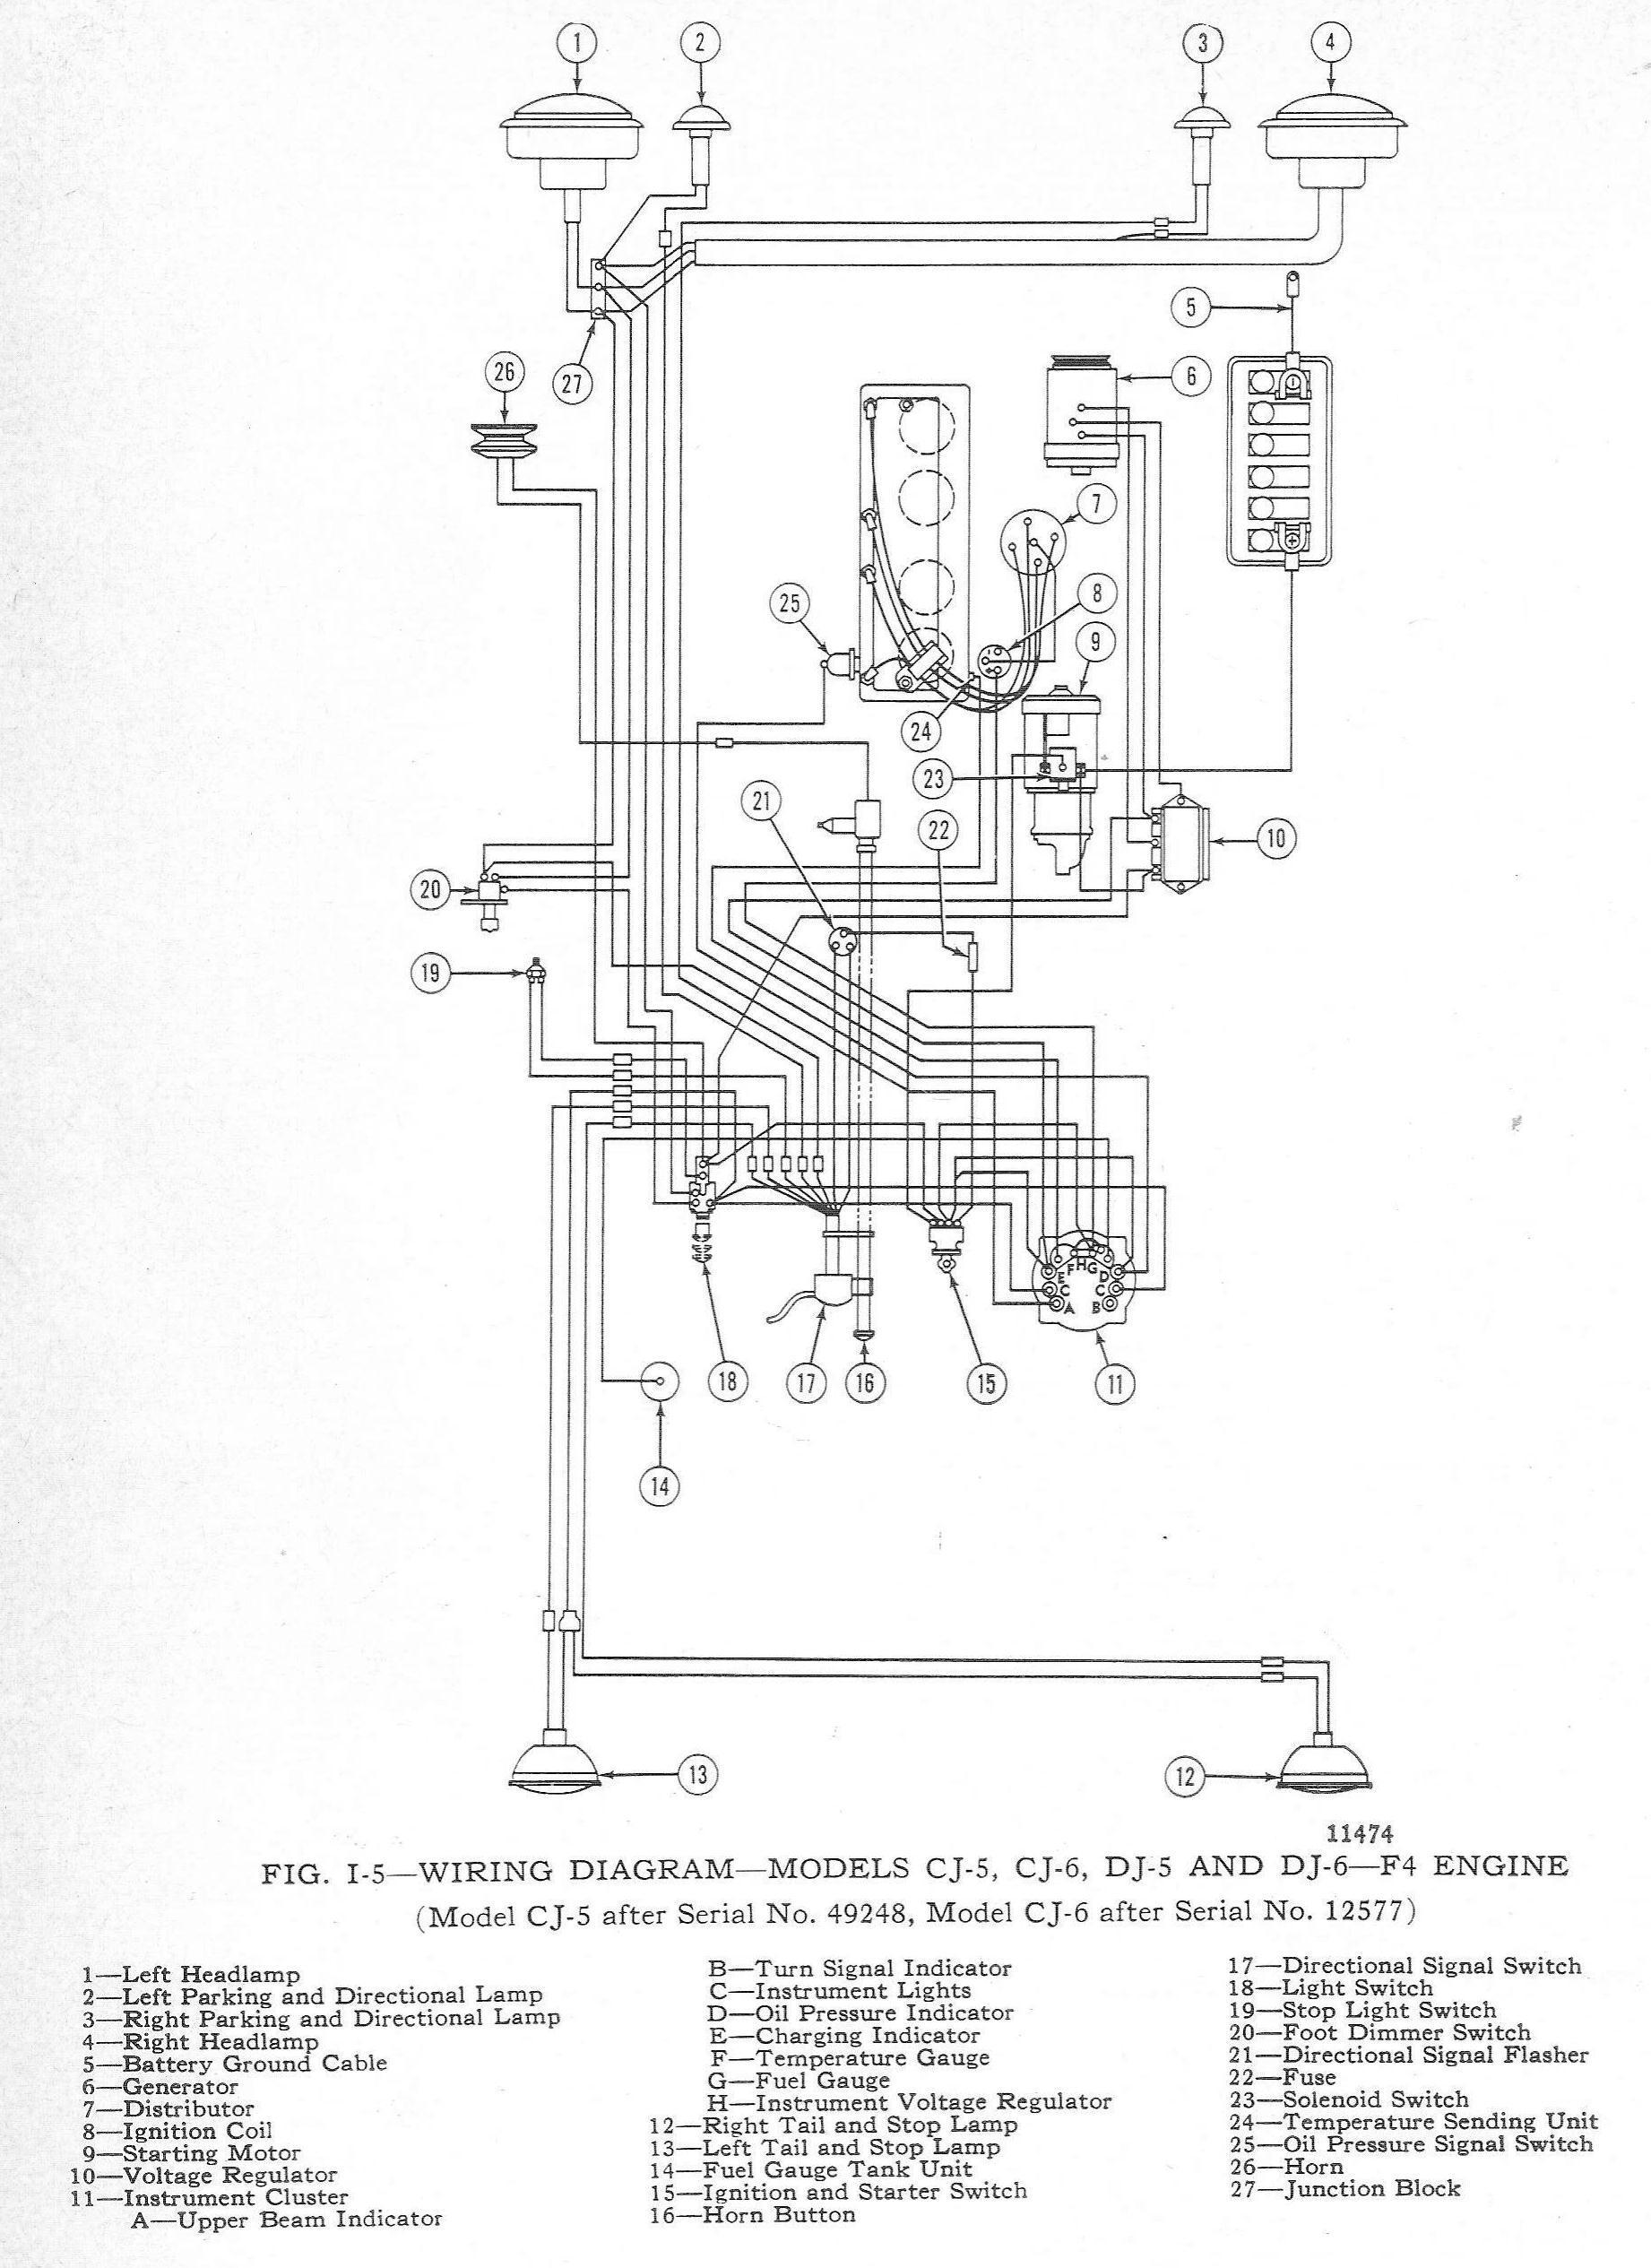 [BZ_4326] Jeep Cj7 Fuel Gauge Wiring Diagram As Well Jeep ...